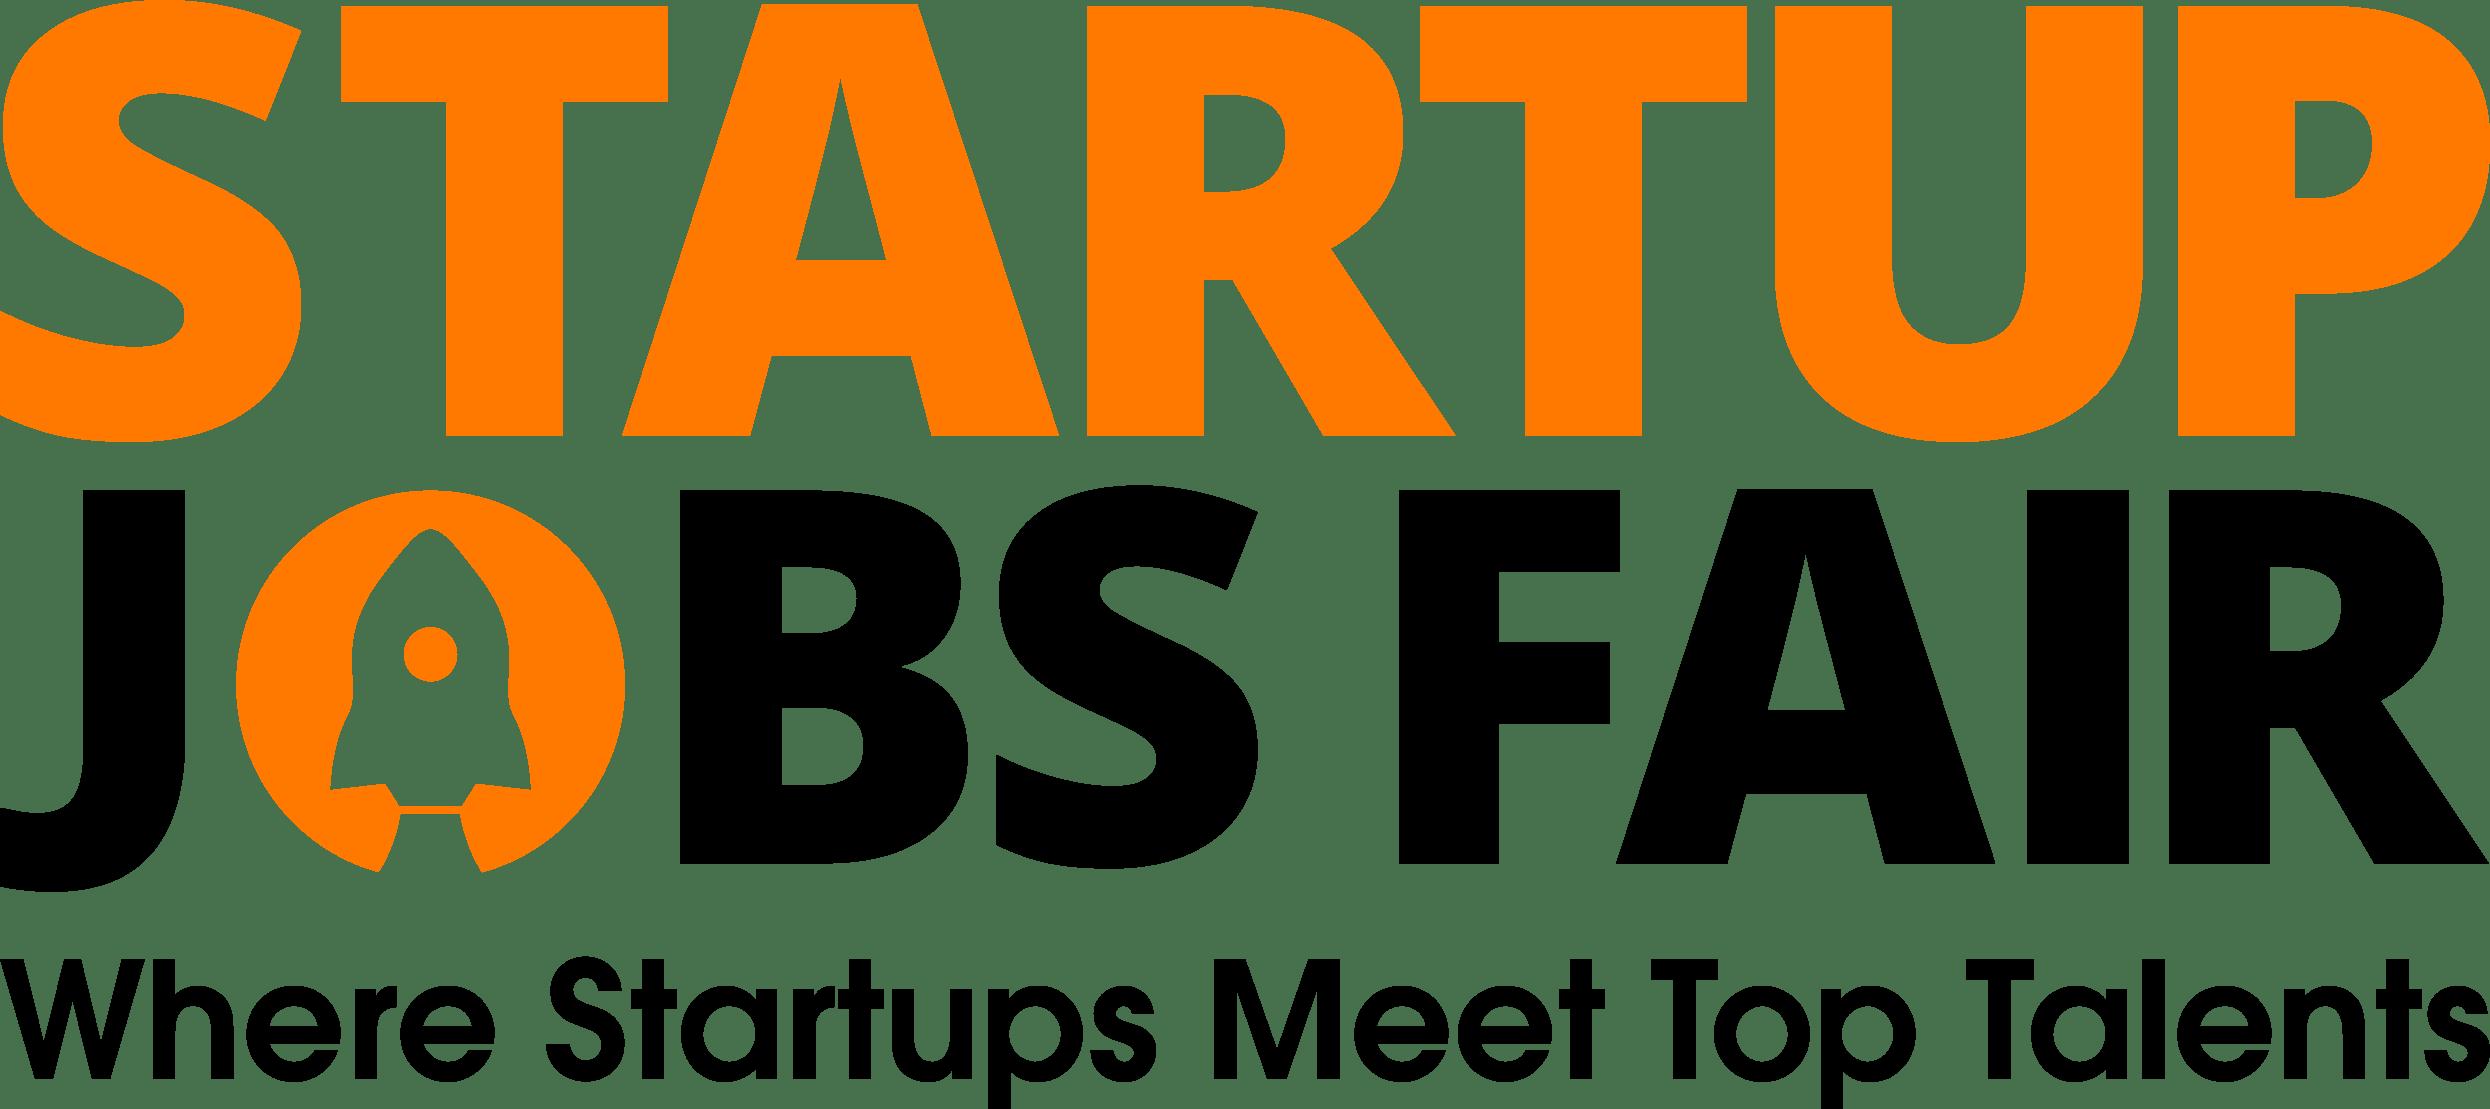 startup jobs fair in berlin. Black Bedroom Furniture Sets. Home Design Ideas